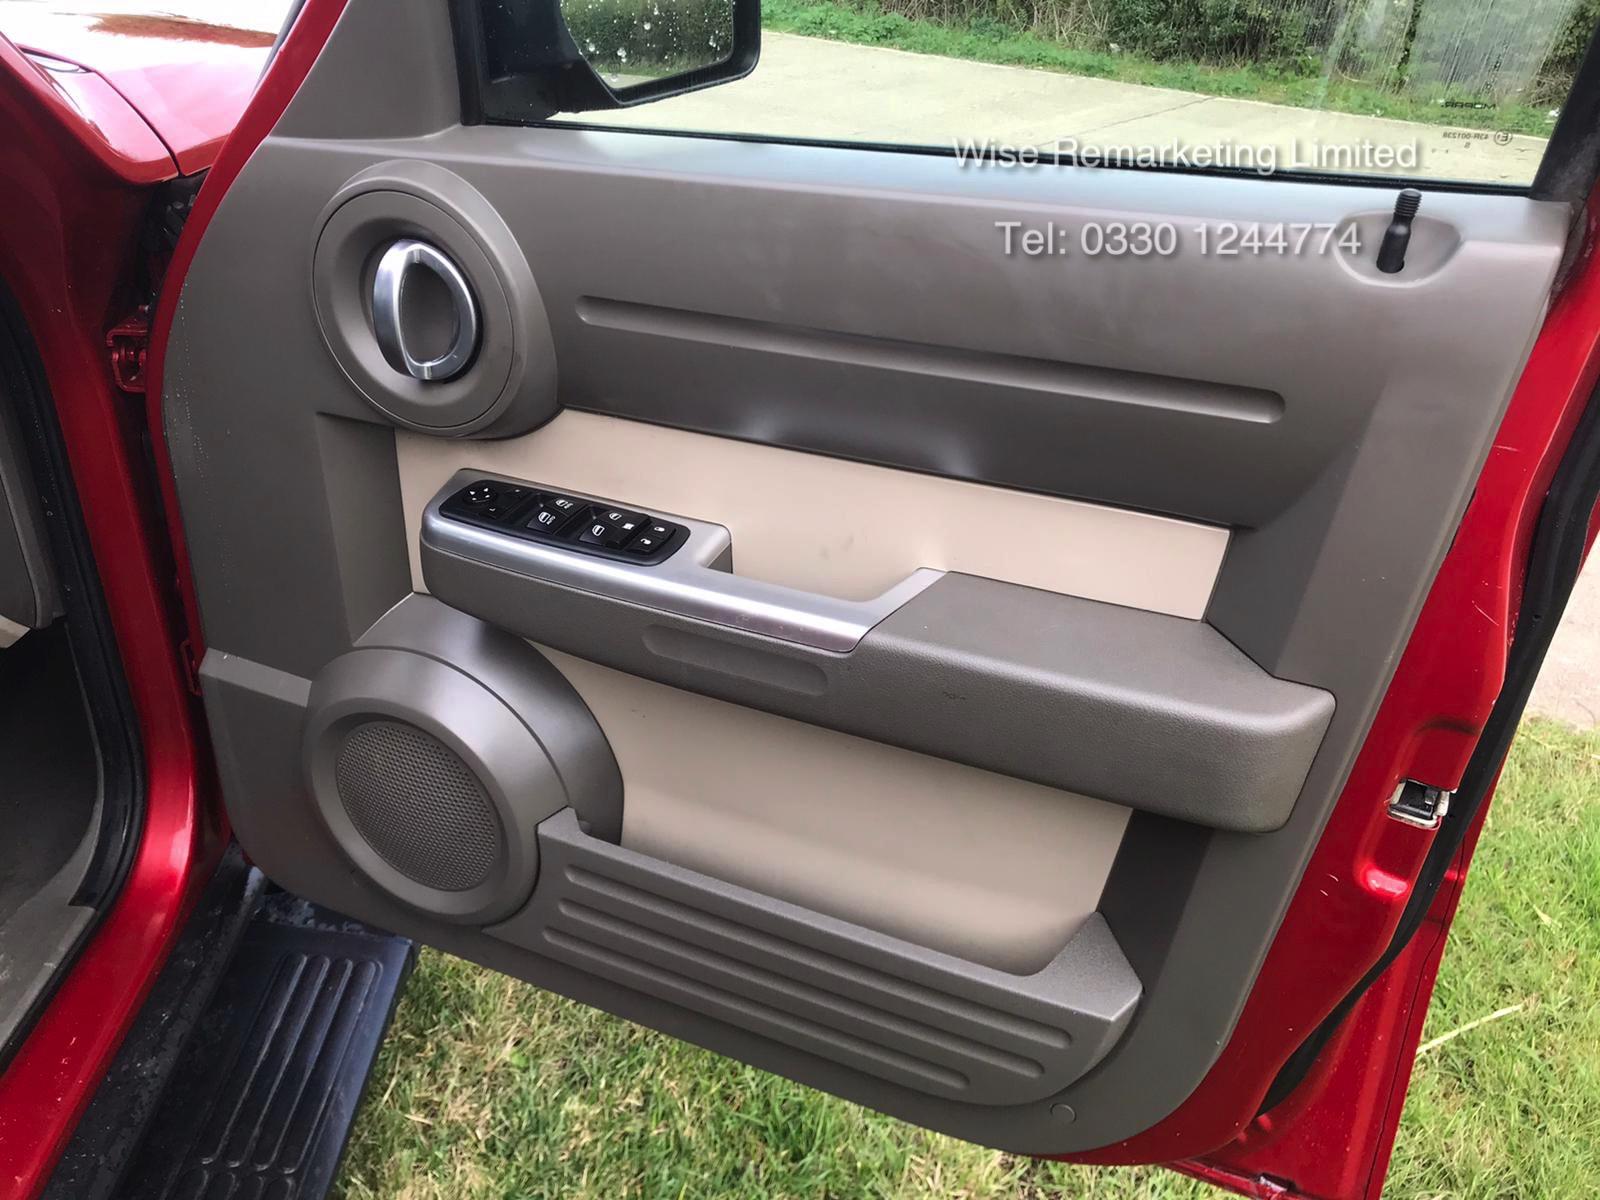 Lot 23 - Dodge Nitro 3.7 SXT - Auto - 2009 09 Reg - 203 BHP - 4X4 - Tow Bar - Heated Seats - Part Leather